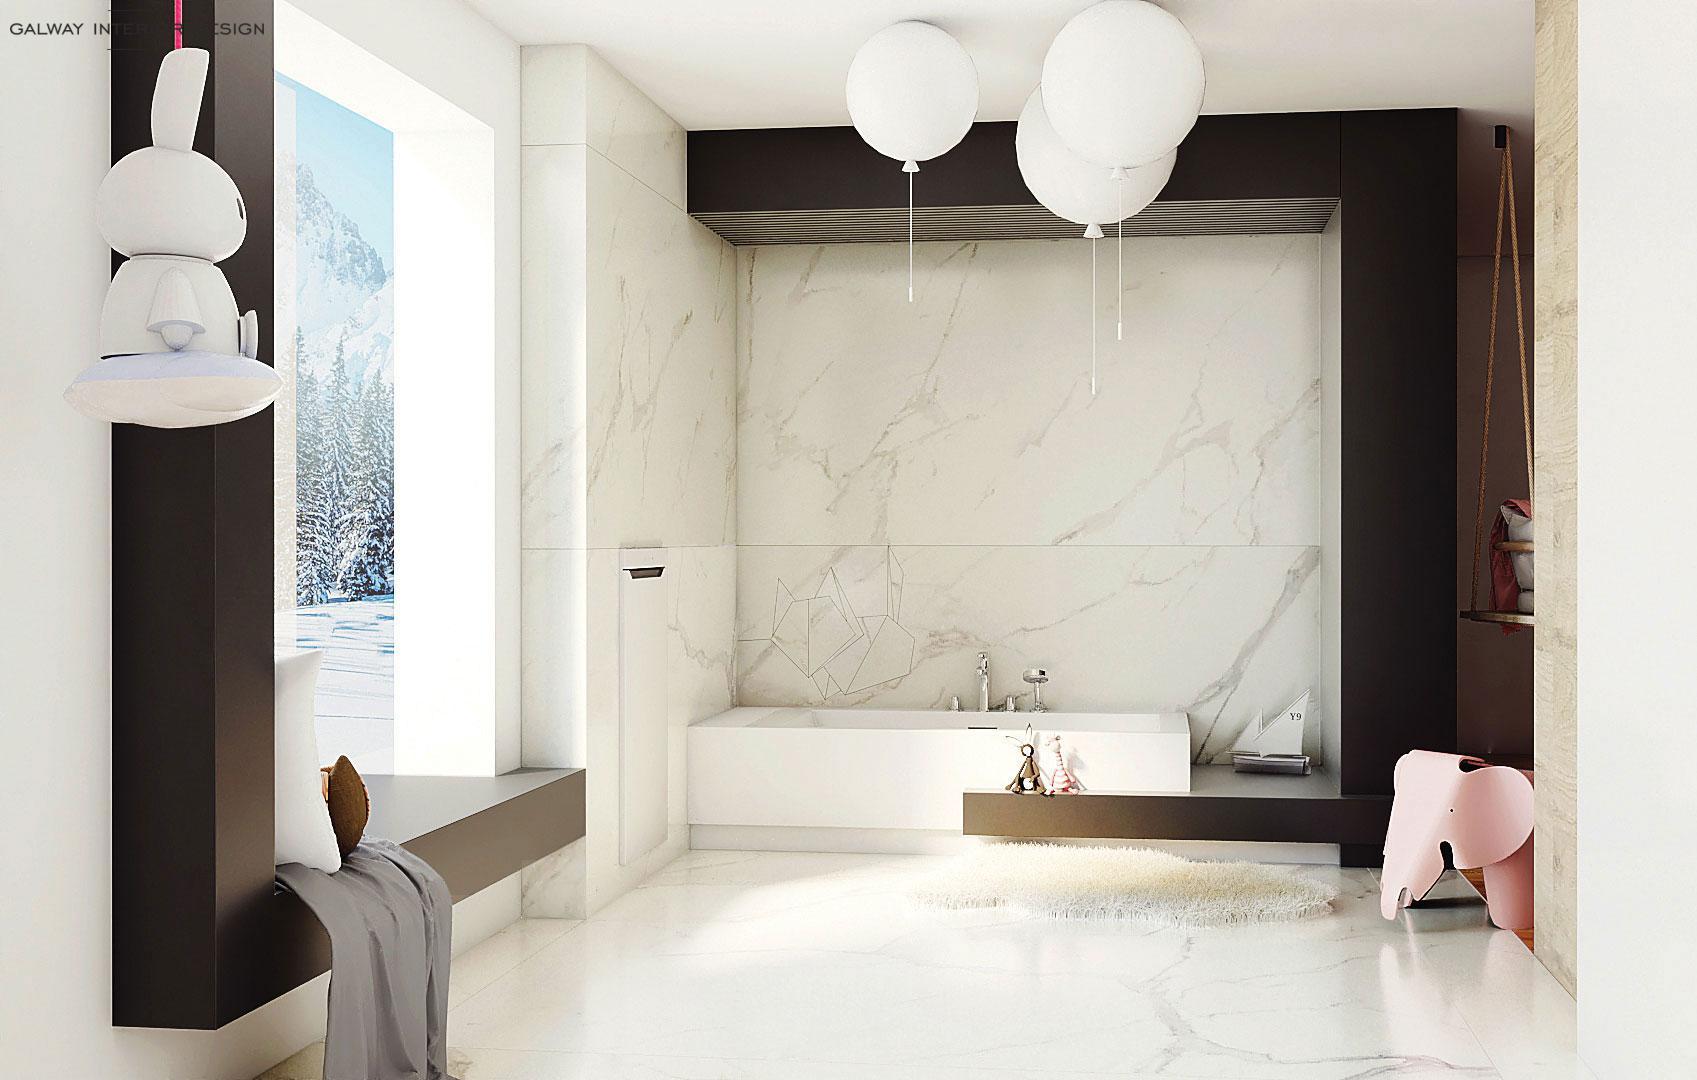 Galway Interior Design Elegant Kids Bathroom Idea 1